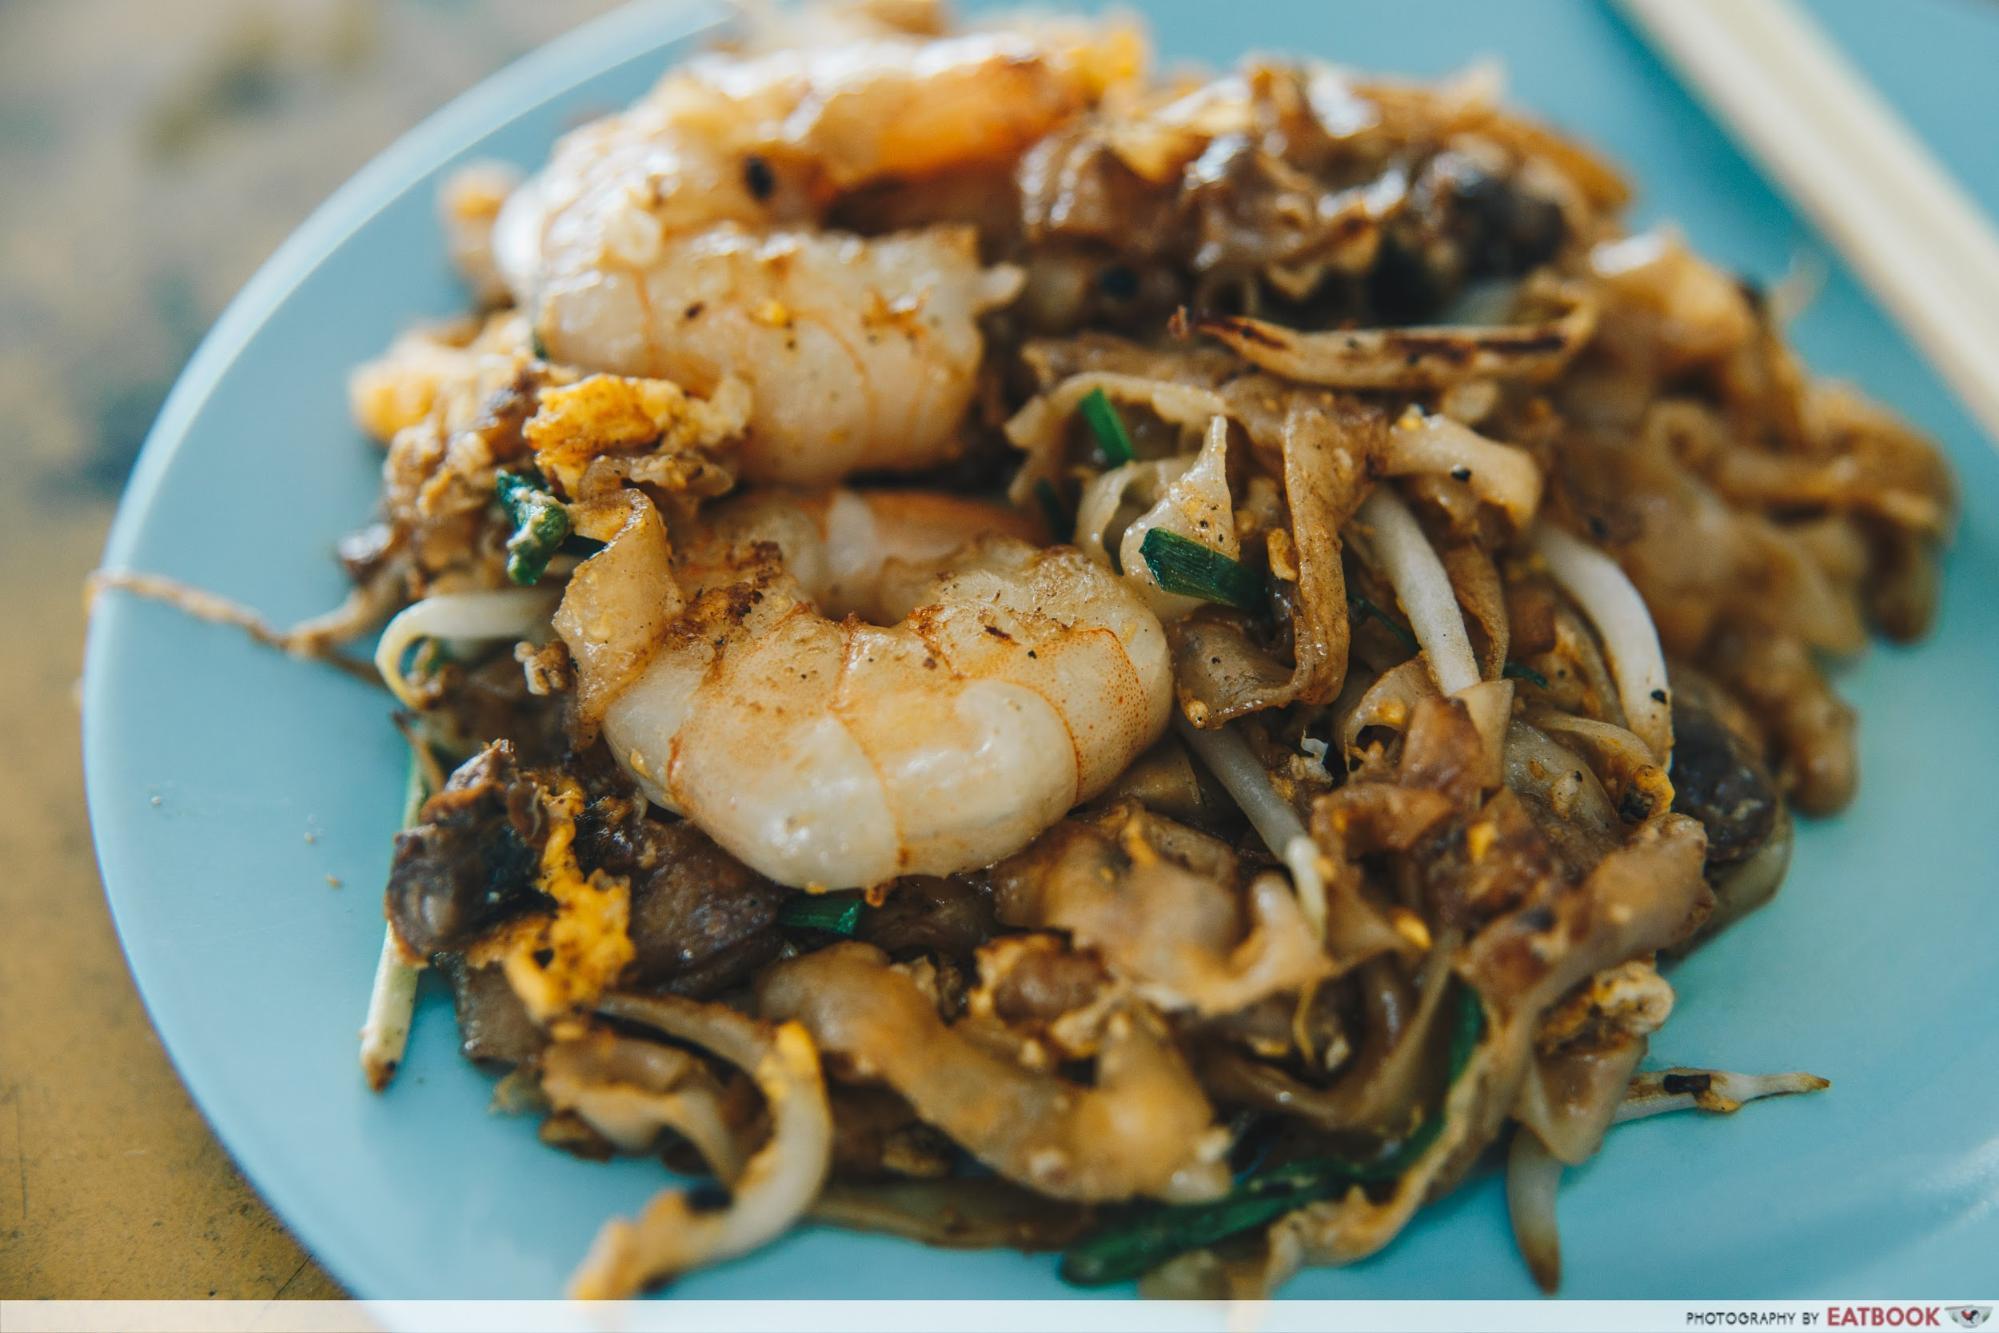 Penang Hawker Food - Char Kway Teow